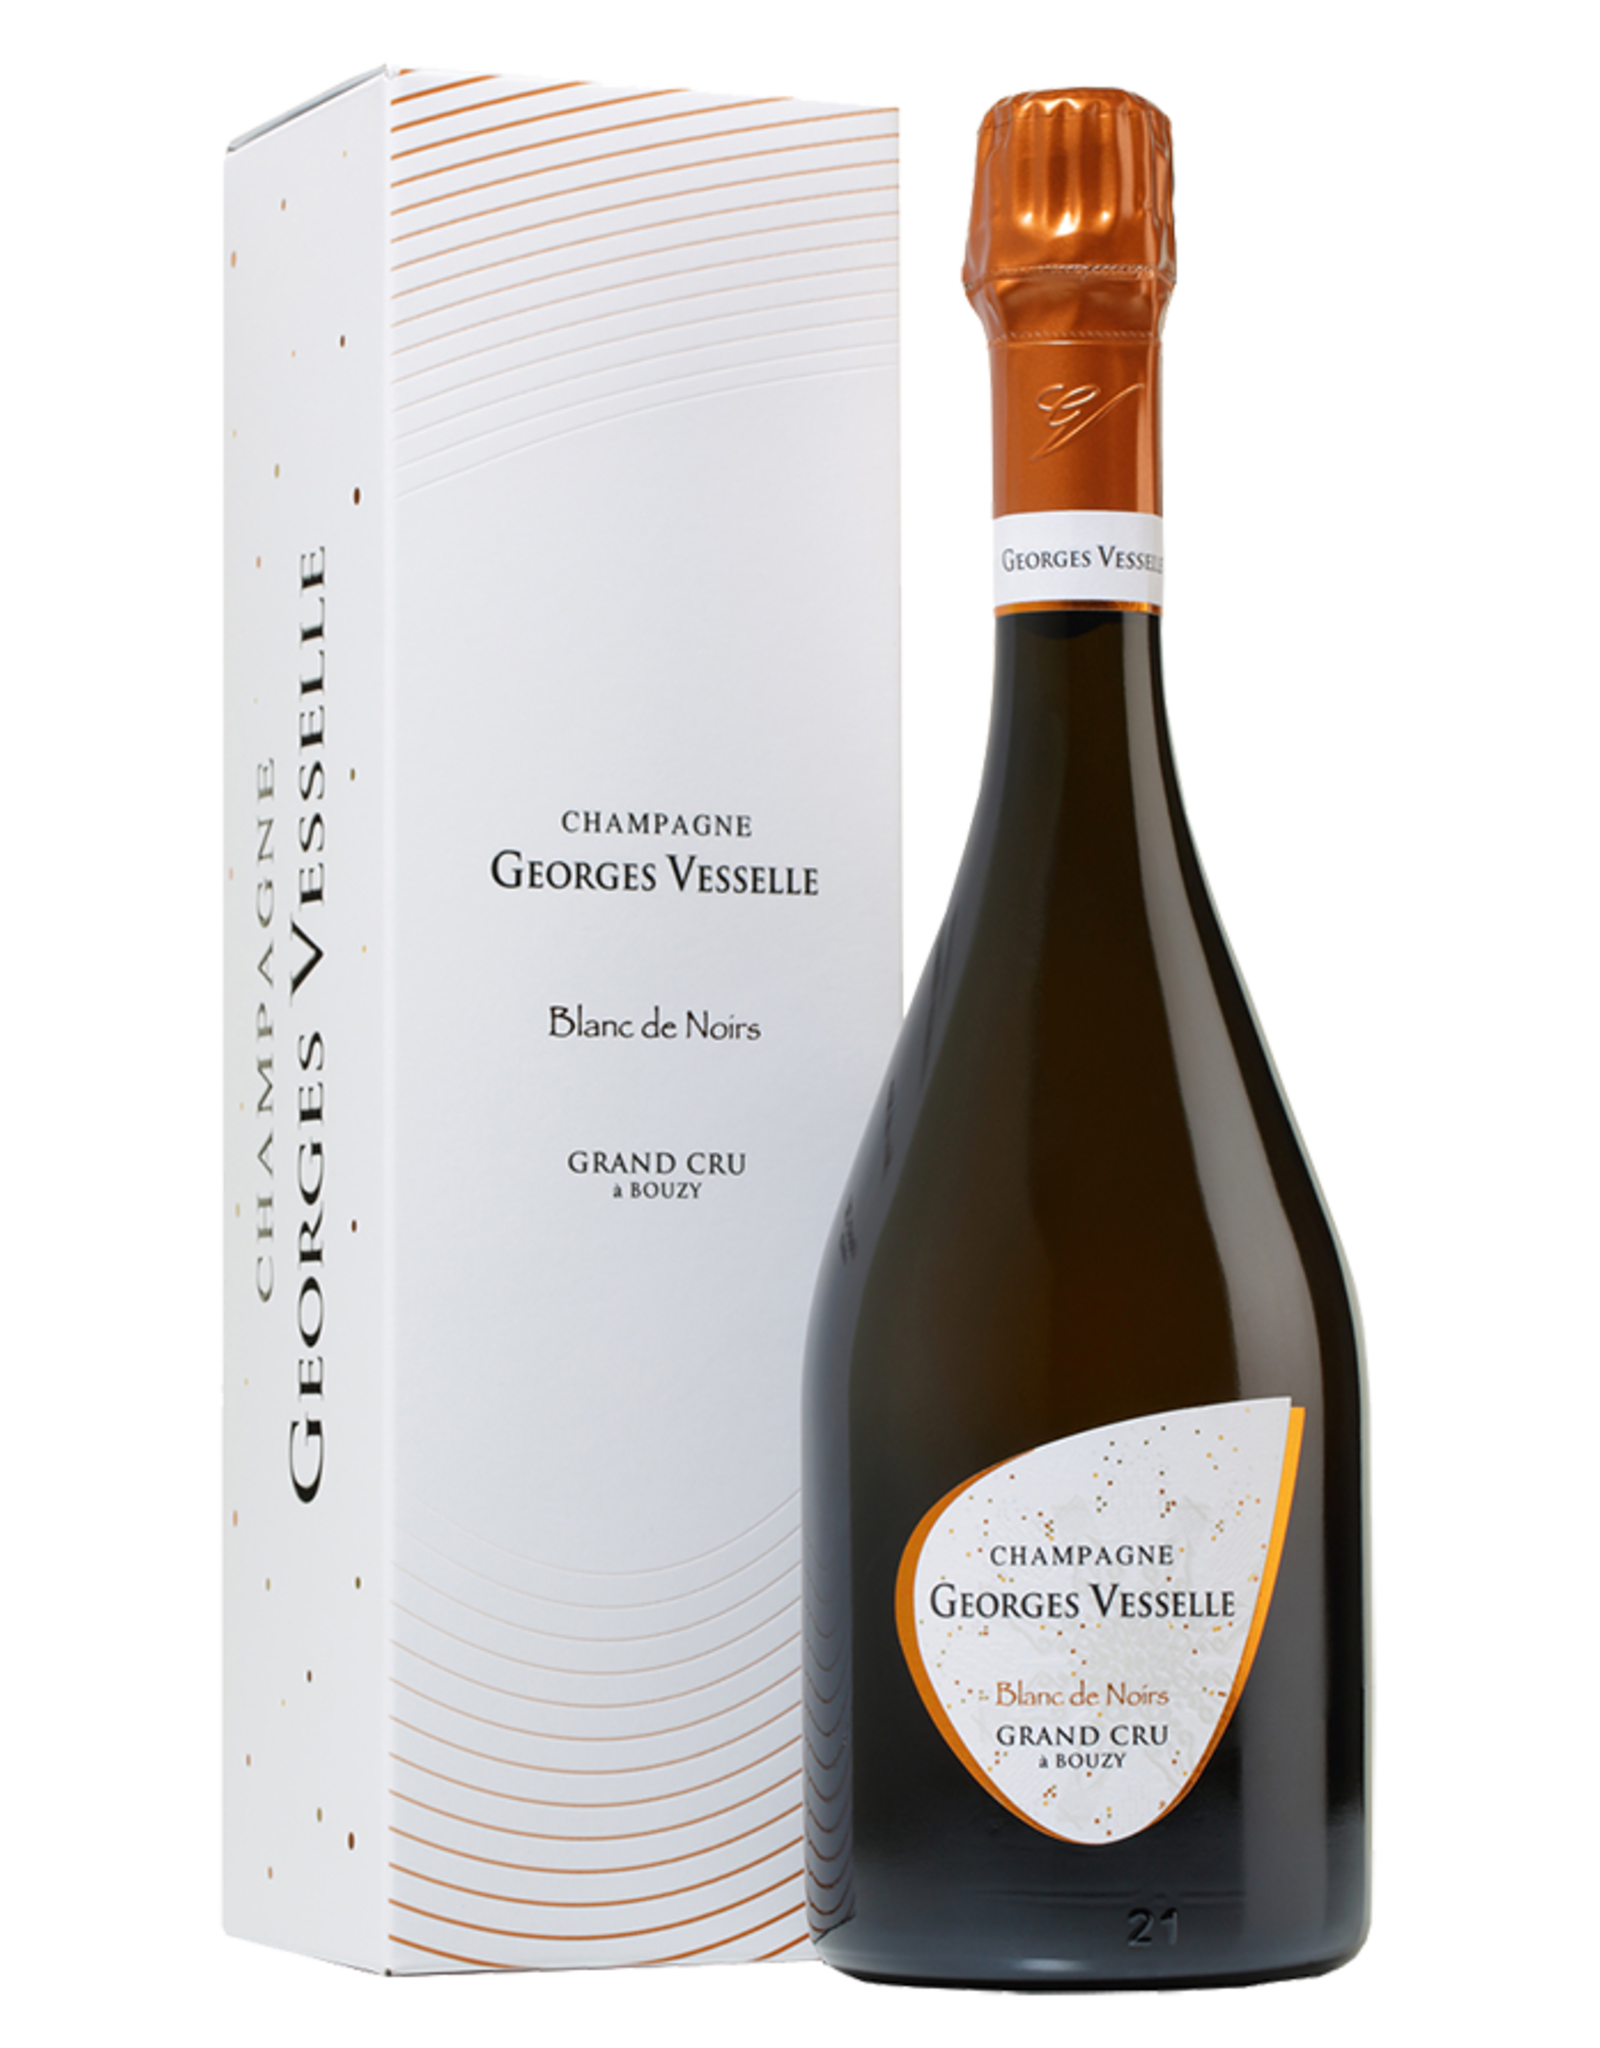 Georges Vesselle Champagne Georges Vesselle Blanc de Noirs Grand Cru